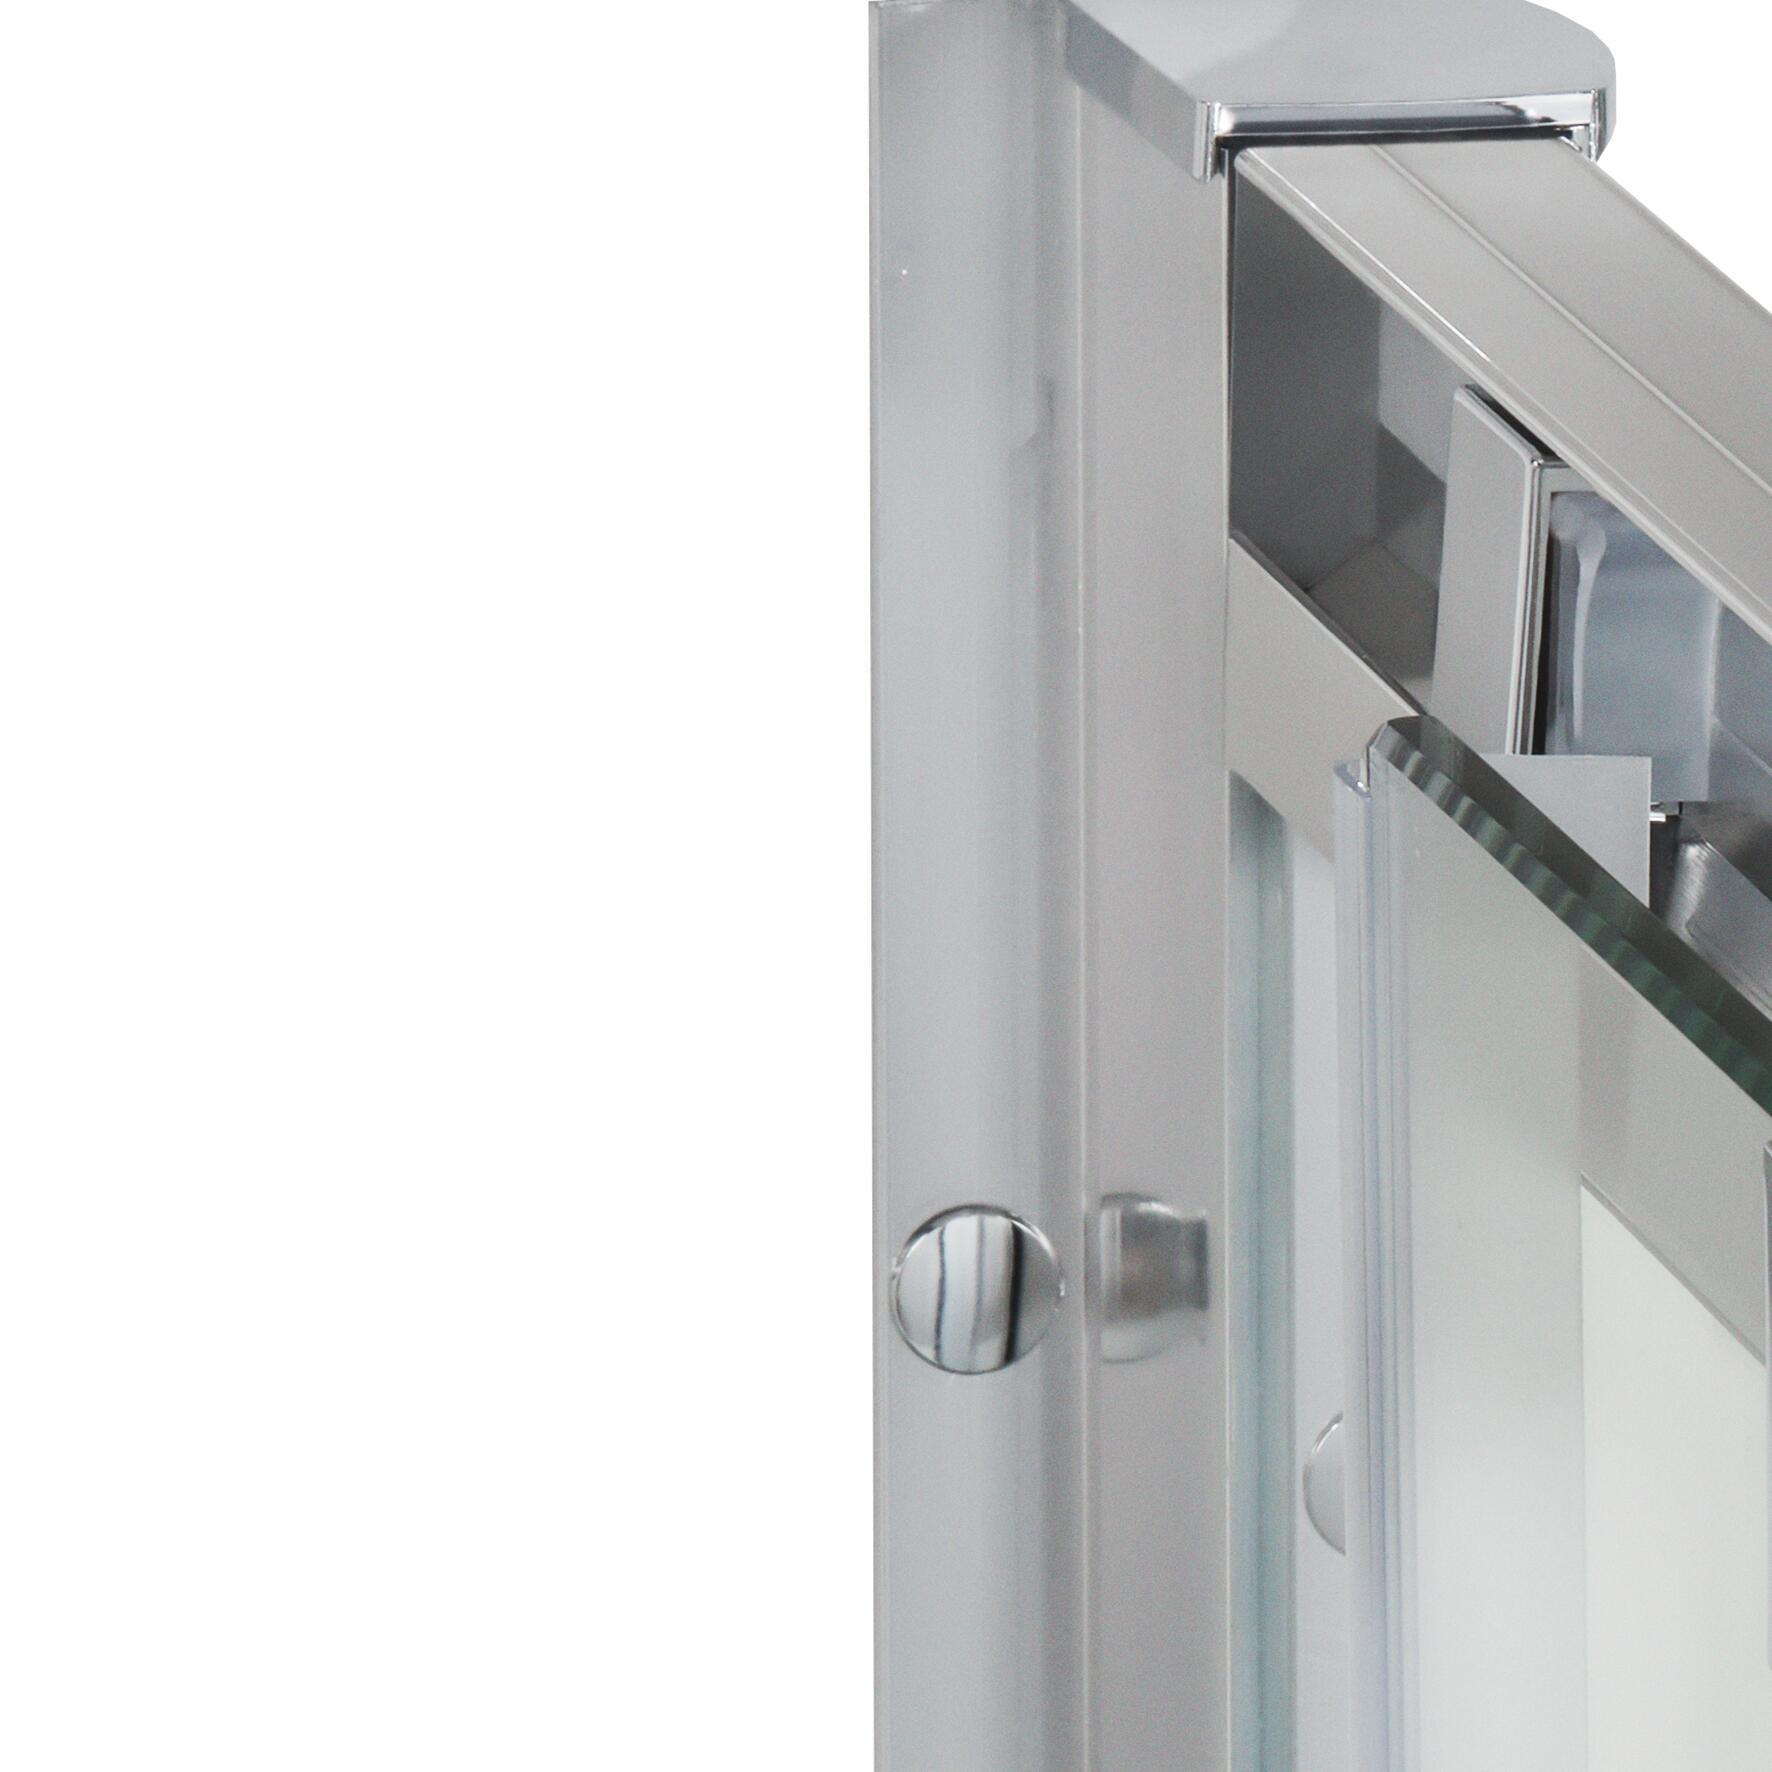 Porta doccia scorrevole Quad 100 cm, H 190 cm in vetro, spessore 6 mm trasparente satinato - 4